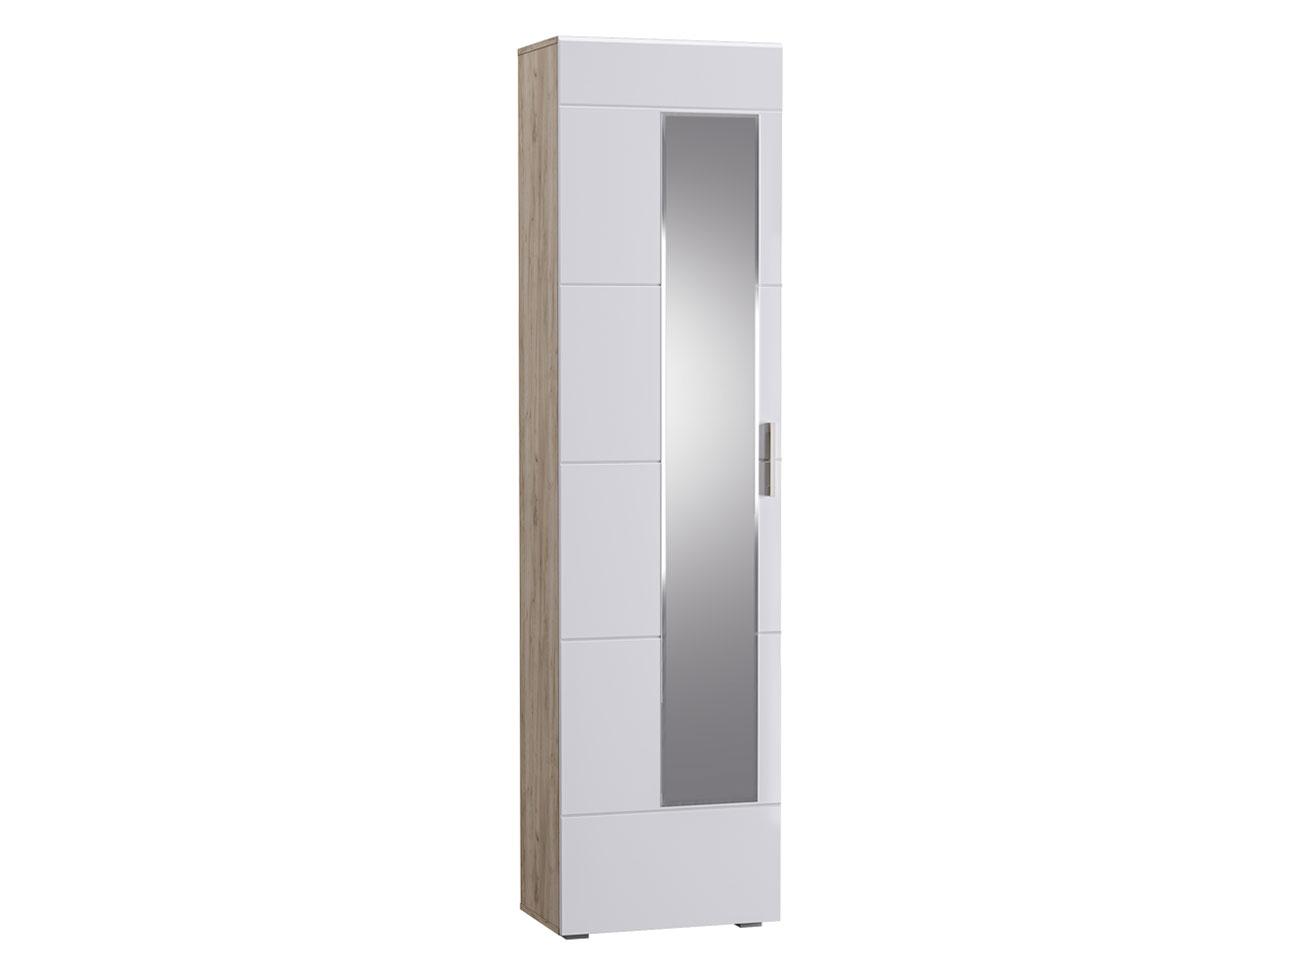 Распашной шкаф Лайн